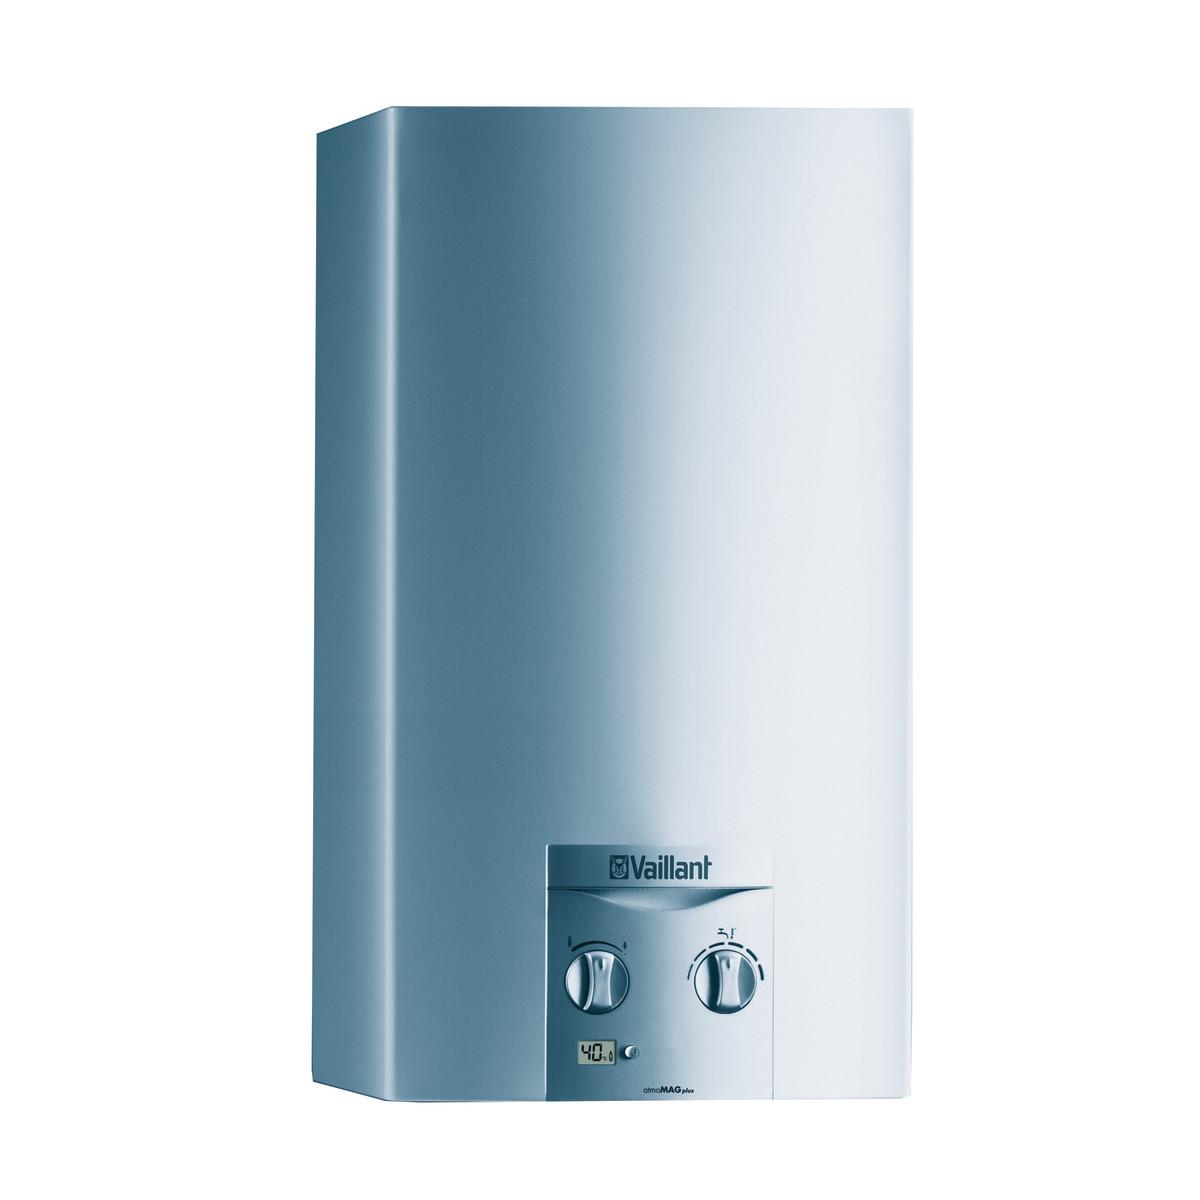 Scaldabagno a gas vaillant atmomag 14 0 1 xi h erp prezzi e offerte online - Scaldabagno leroy merlin ...